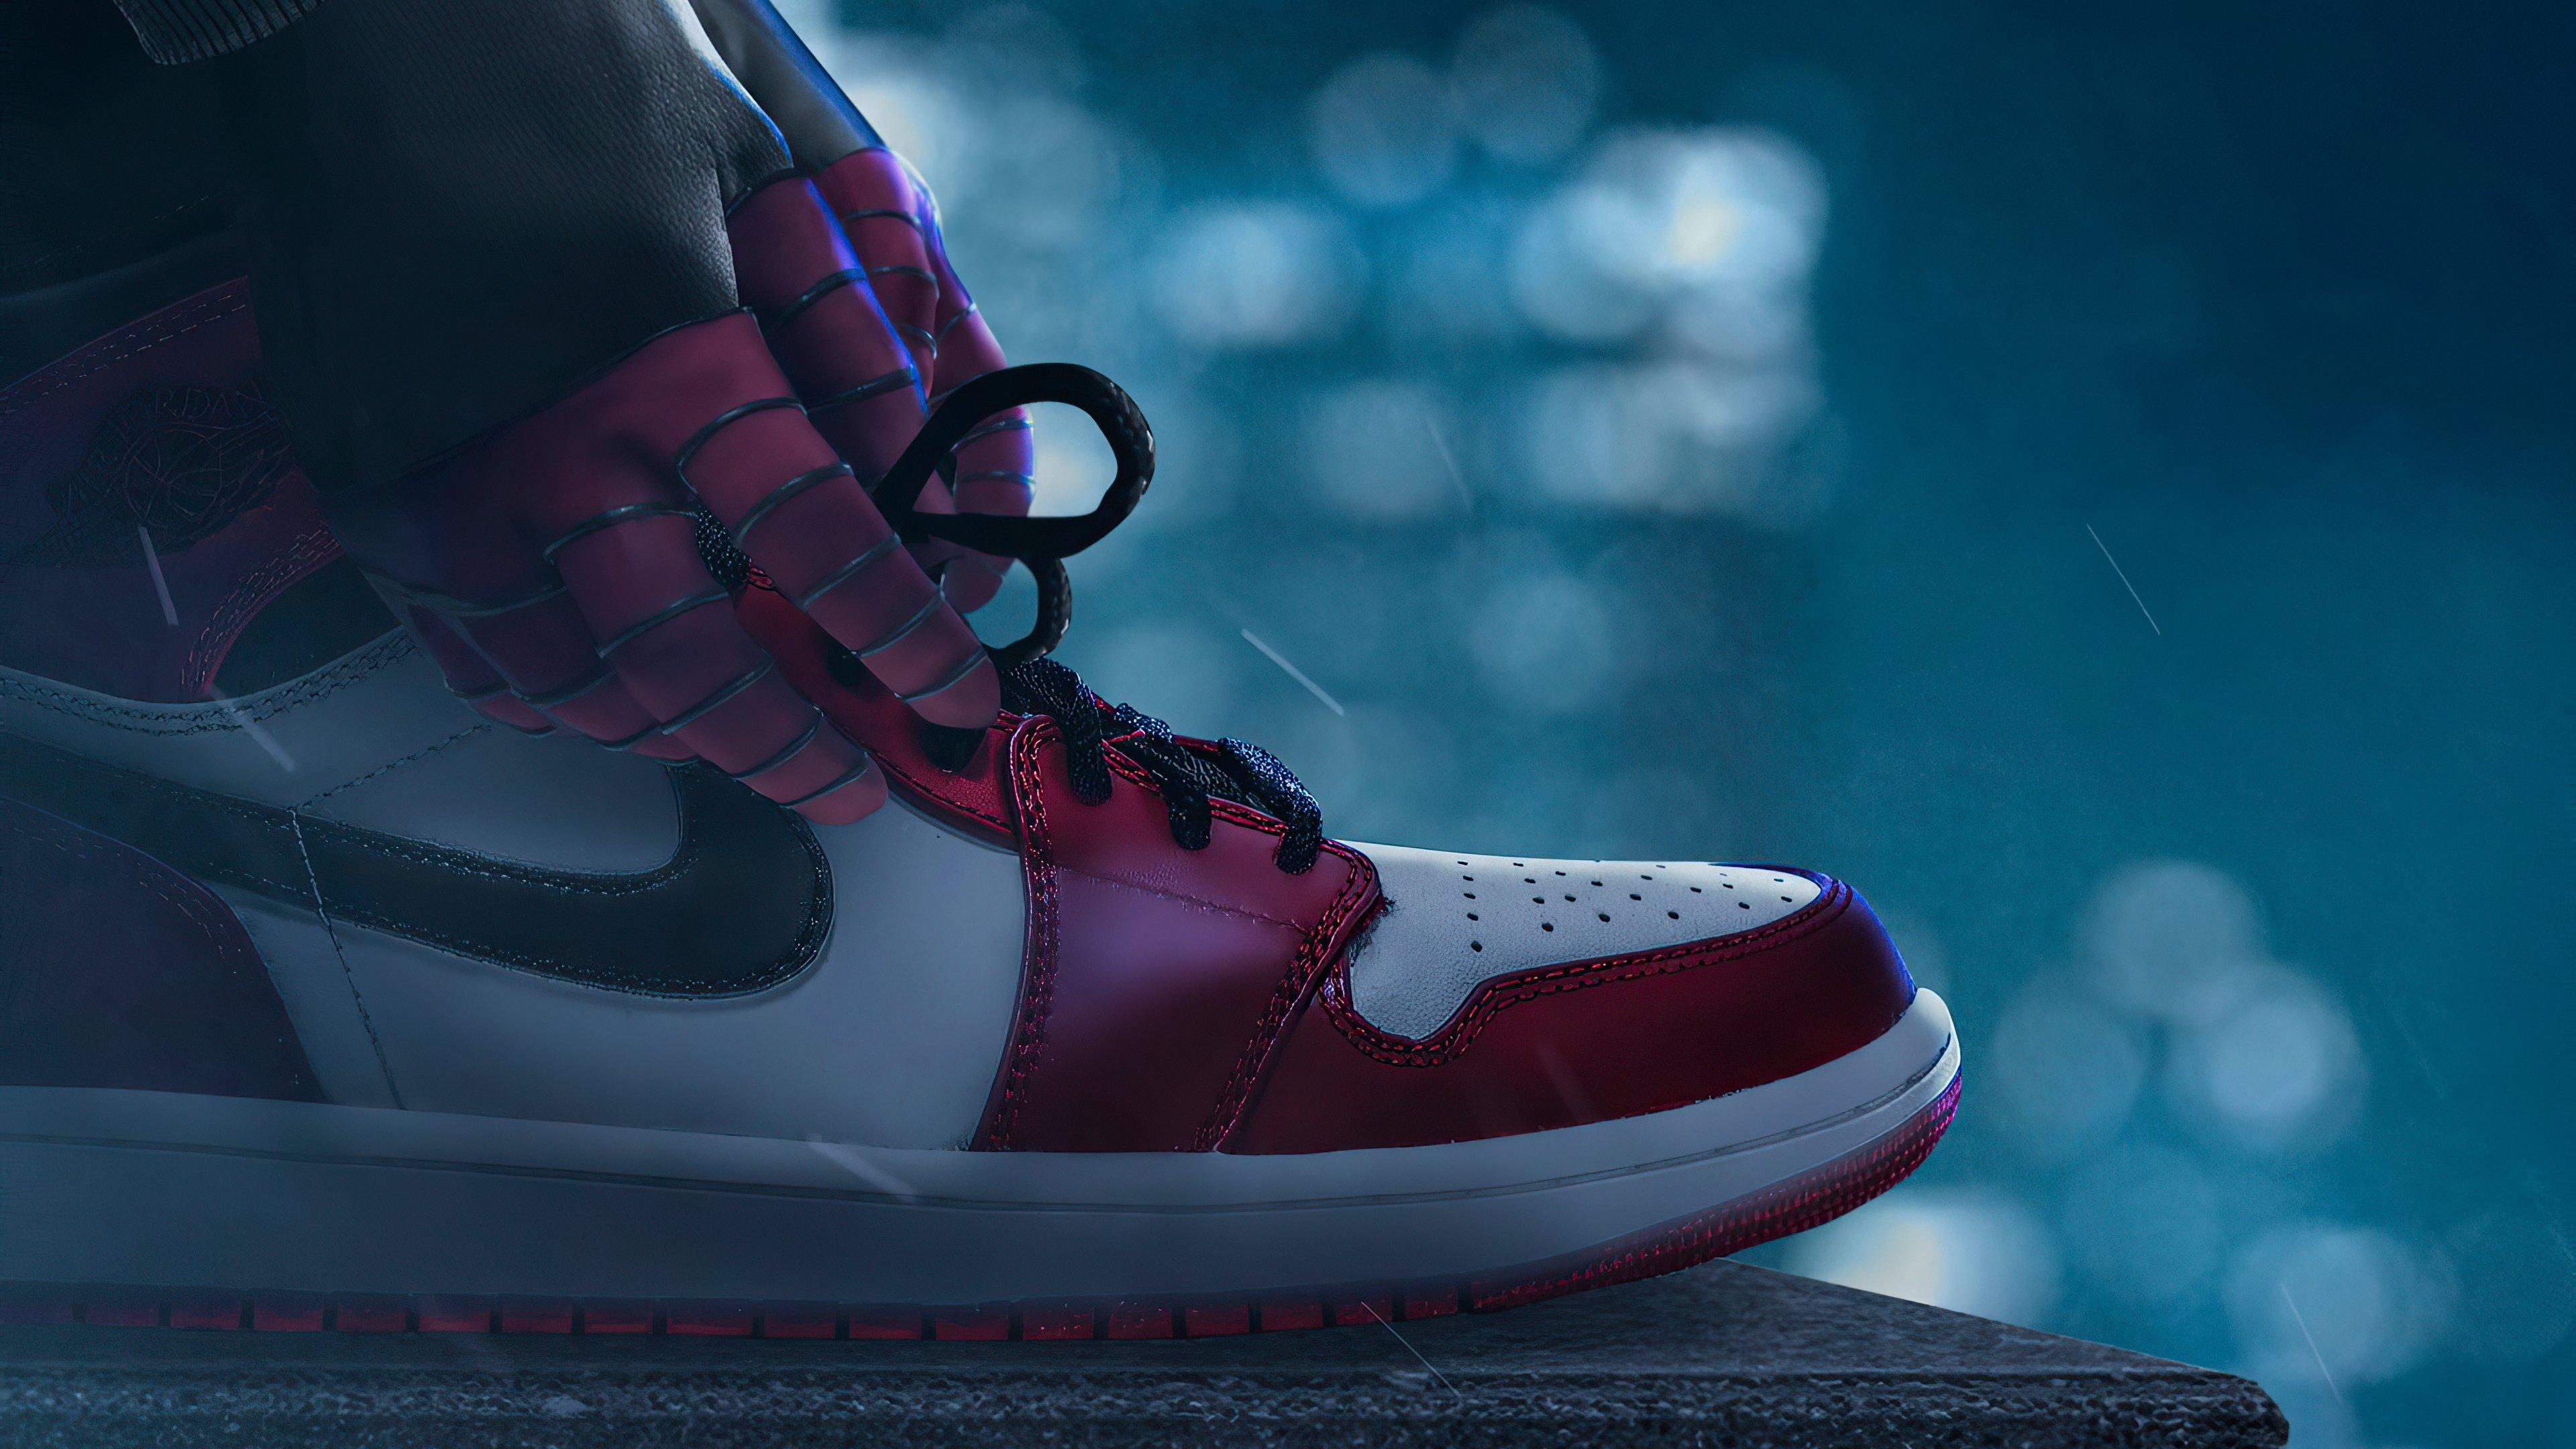 Fondos de pantalla Air Jordan Miles Morales como Spiderman